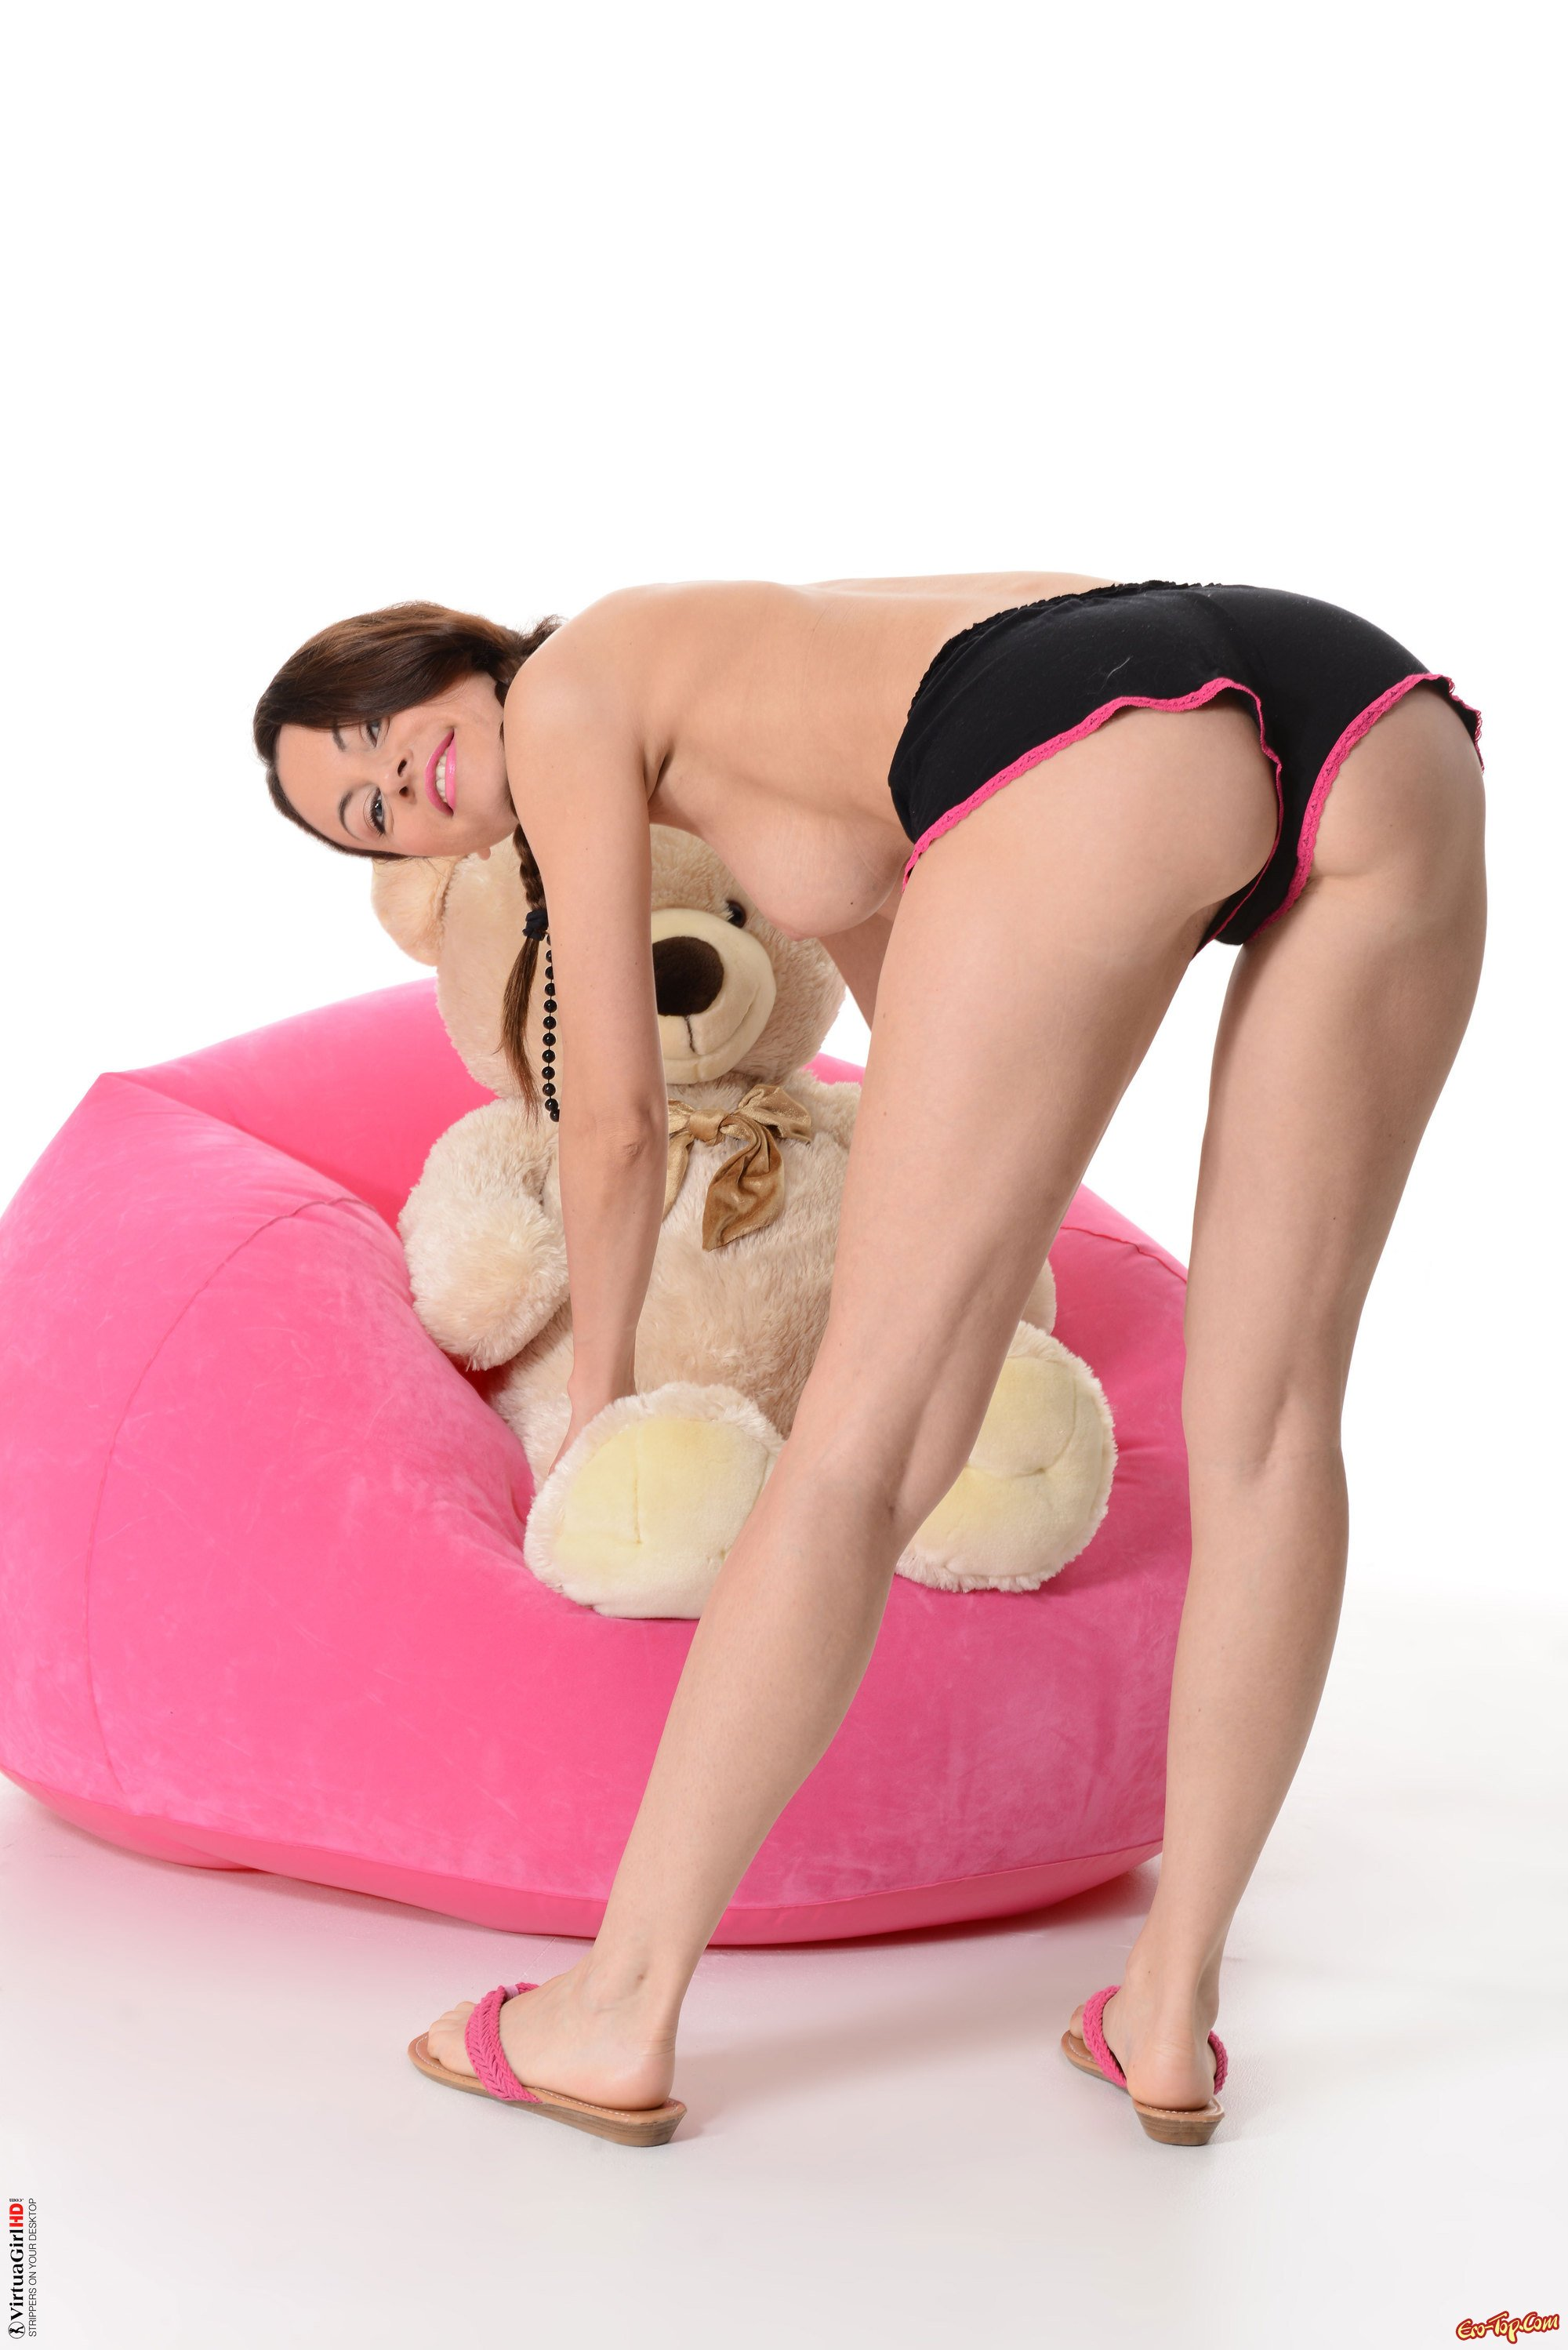 Сучка с мишкой секс фото